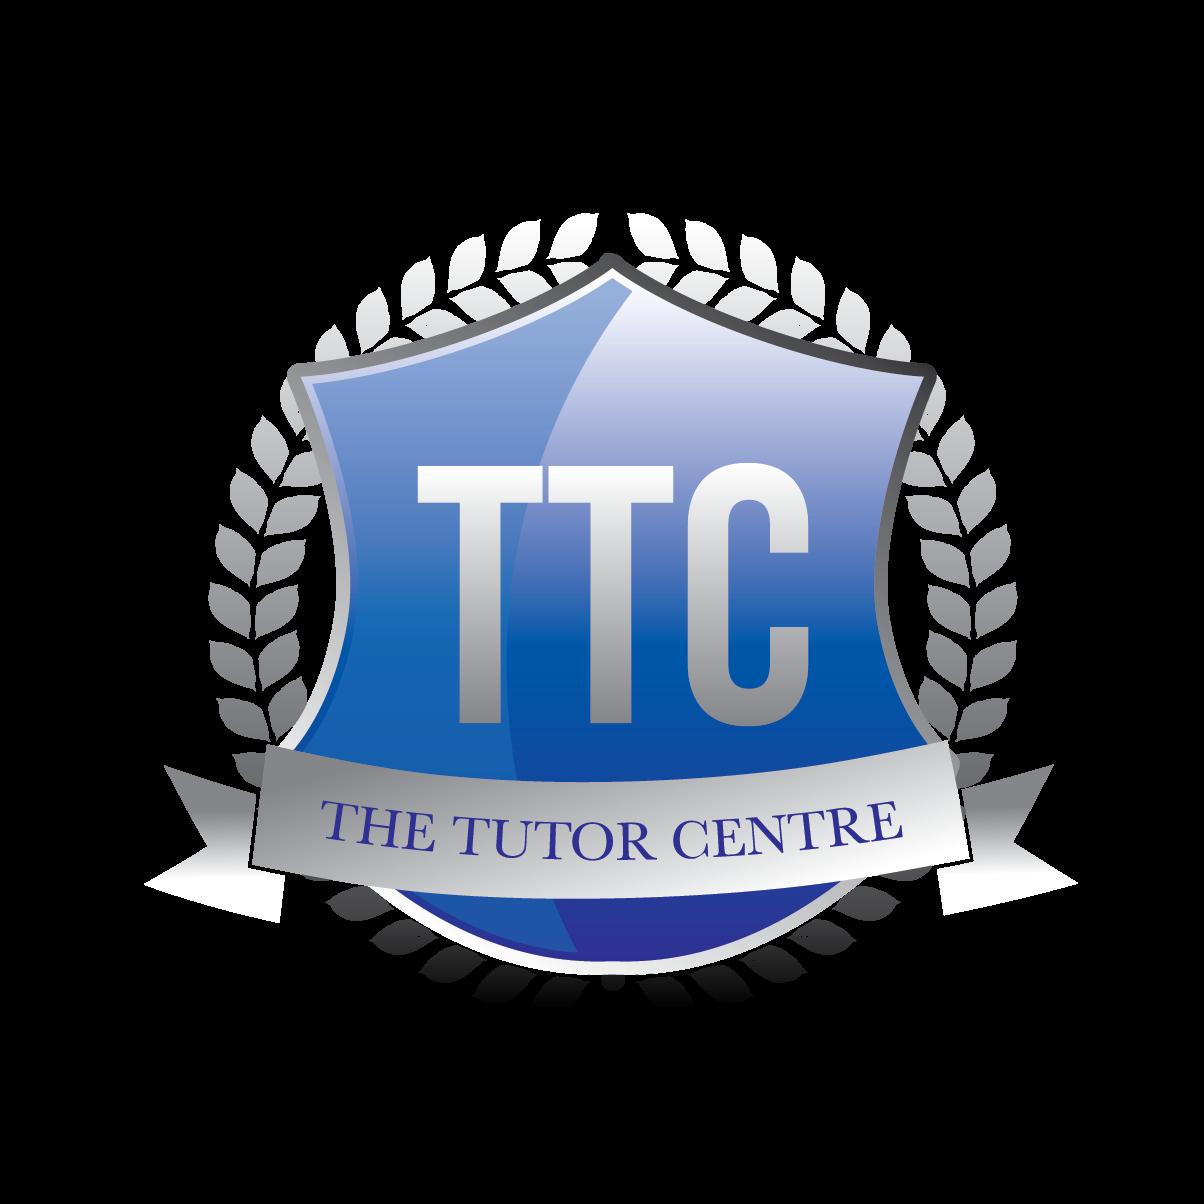 The Tutor Centre